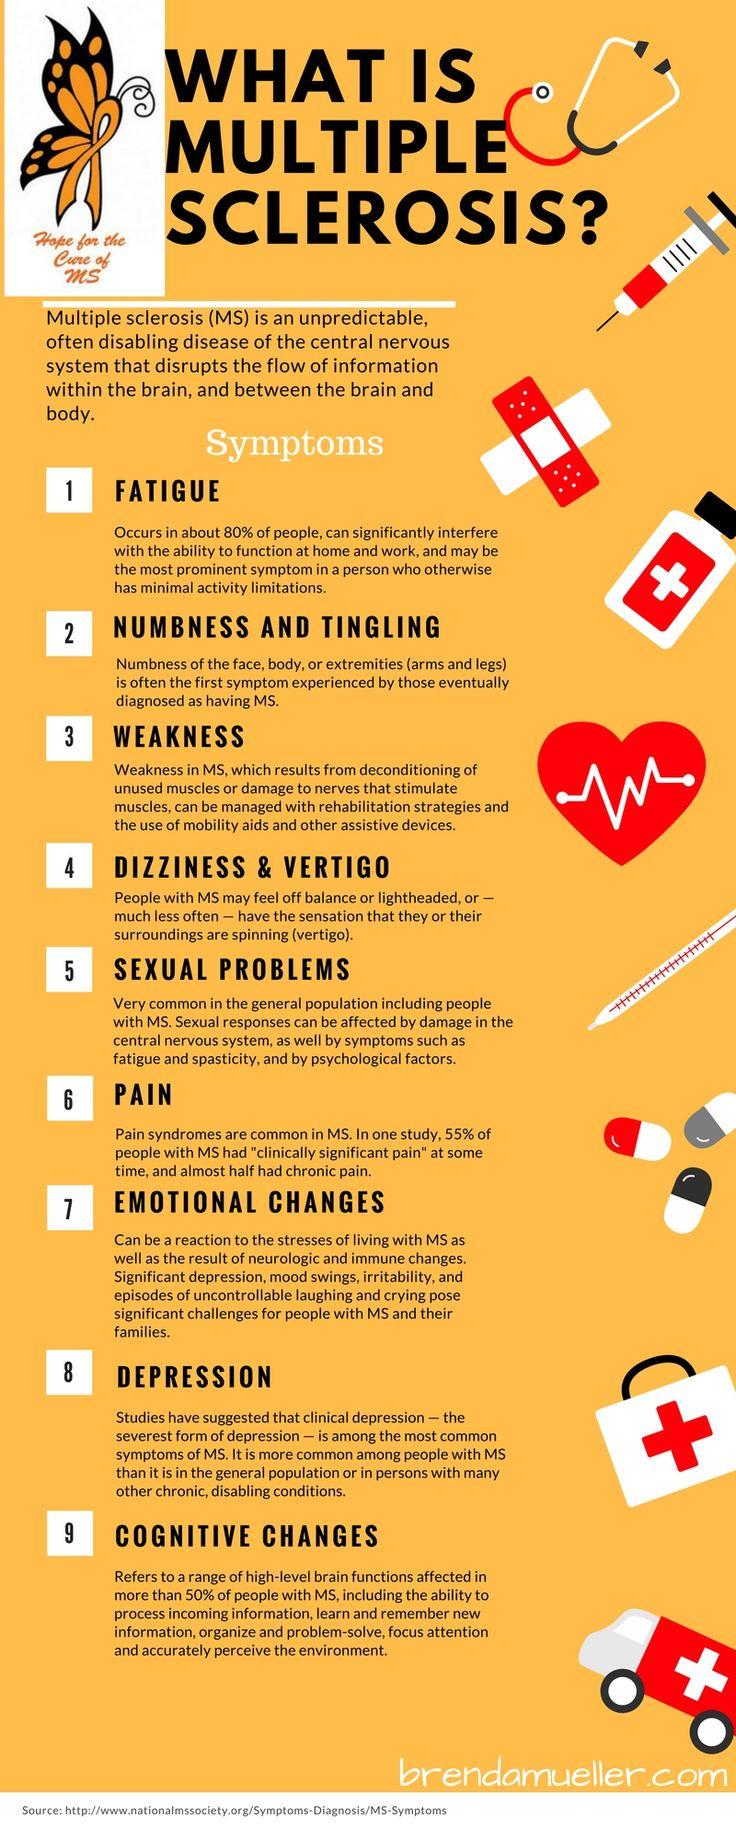 What is Multiple Sclerosis Infographic brendamueller224.blogspot.com